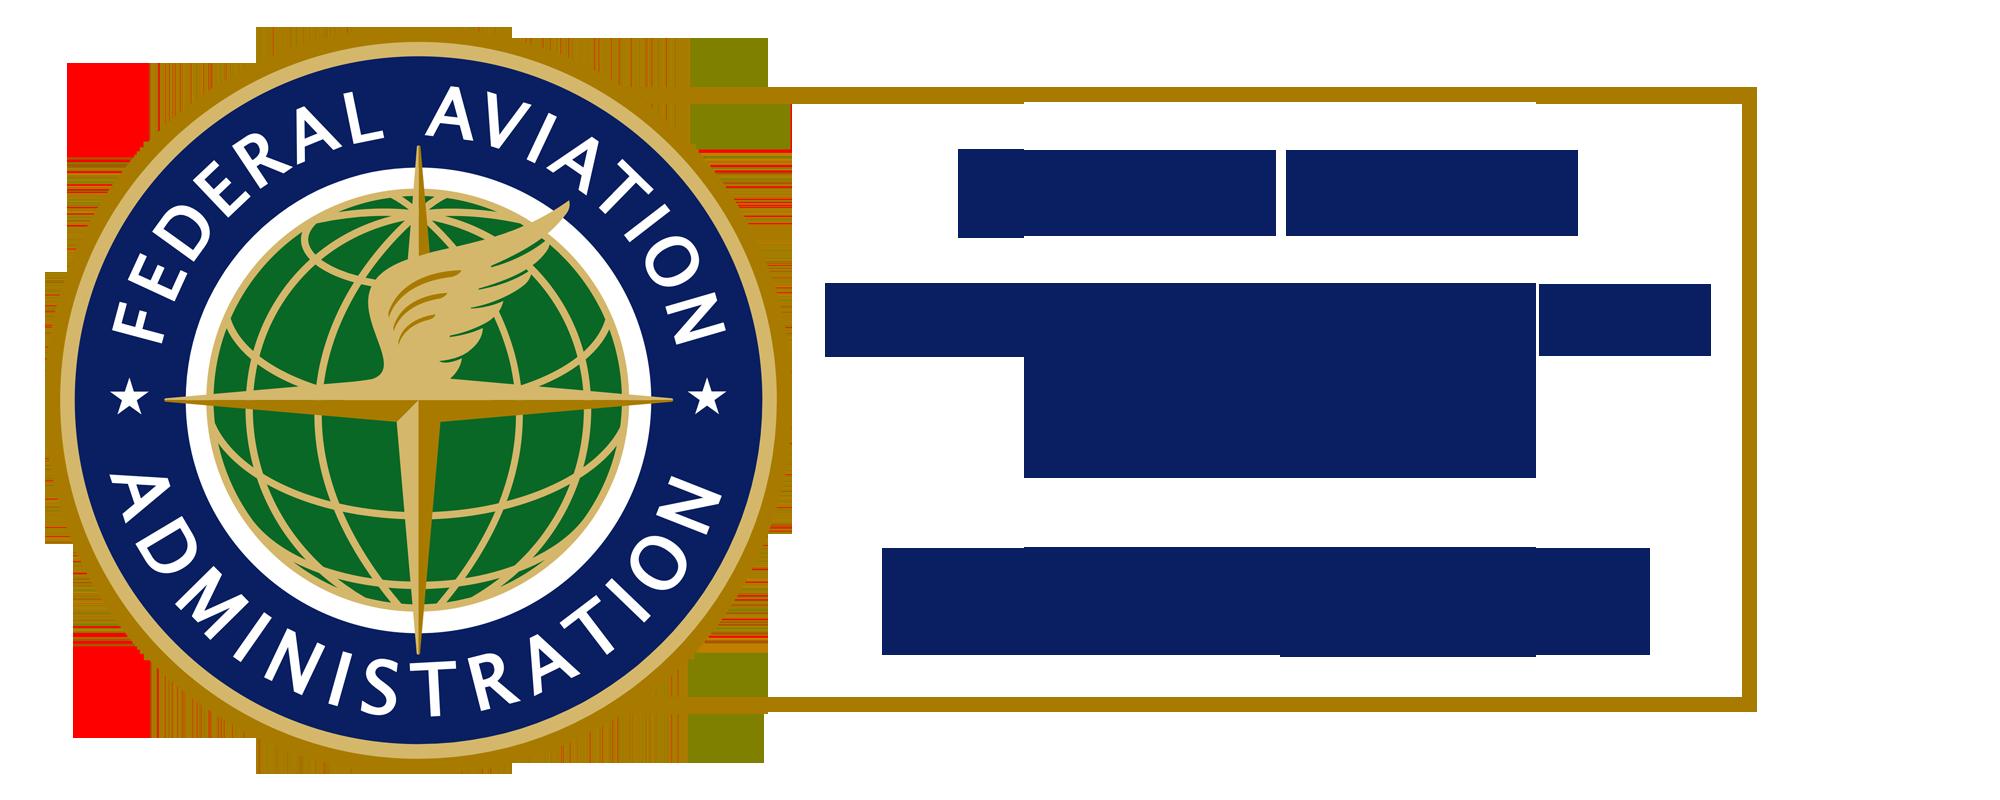 FAA Avionics Repair Station